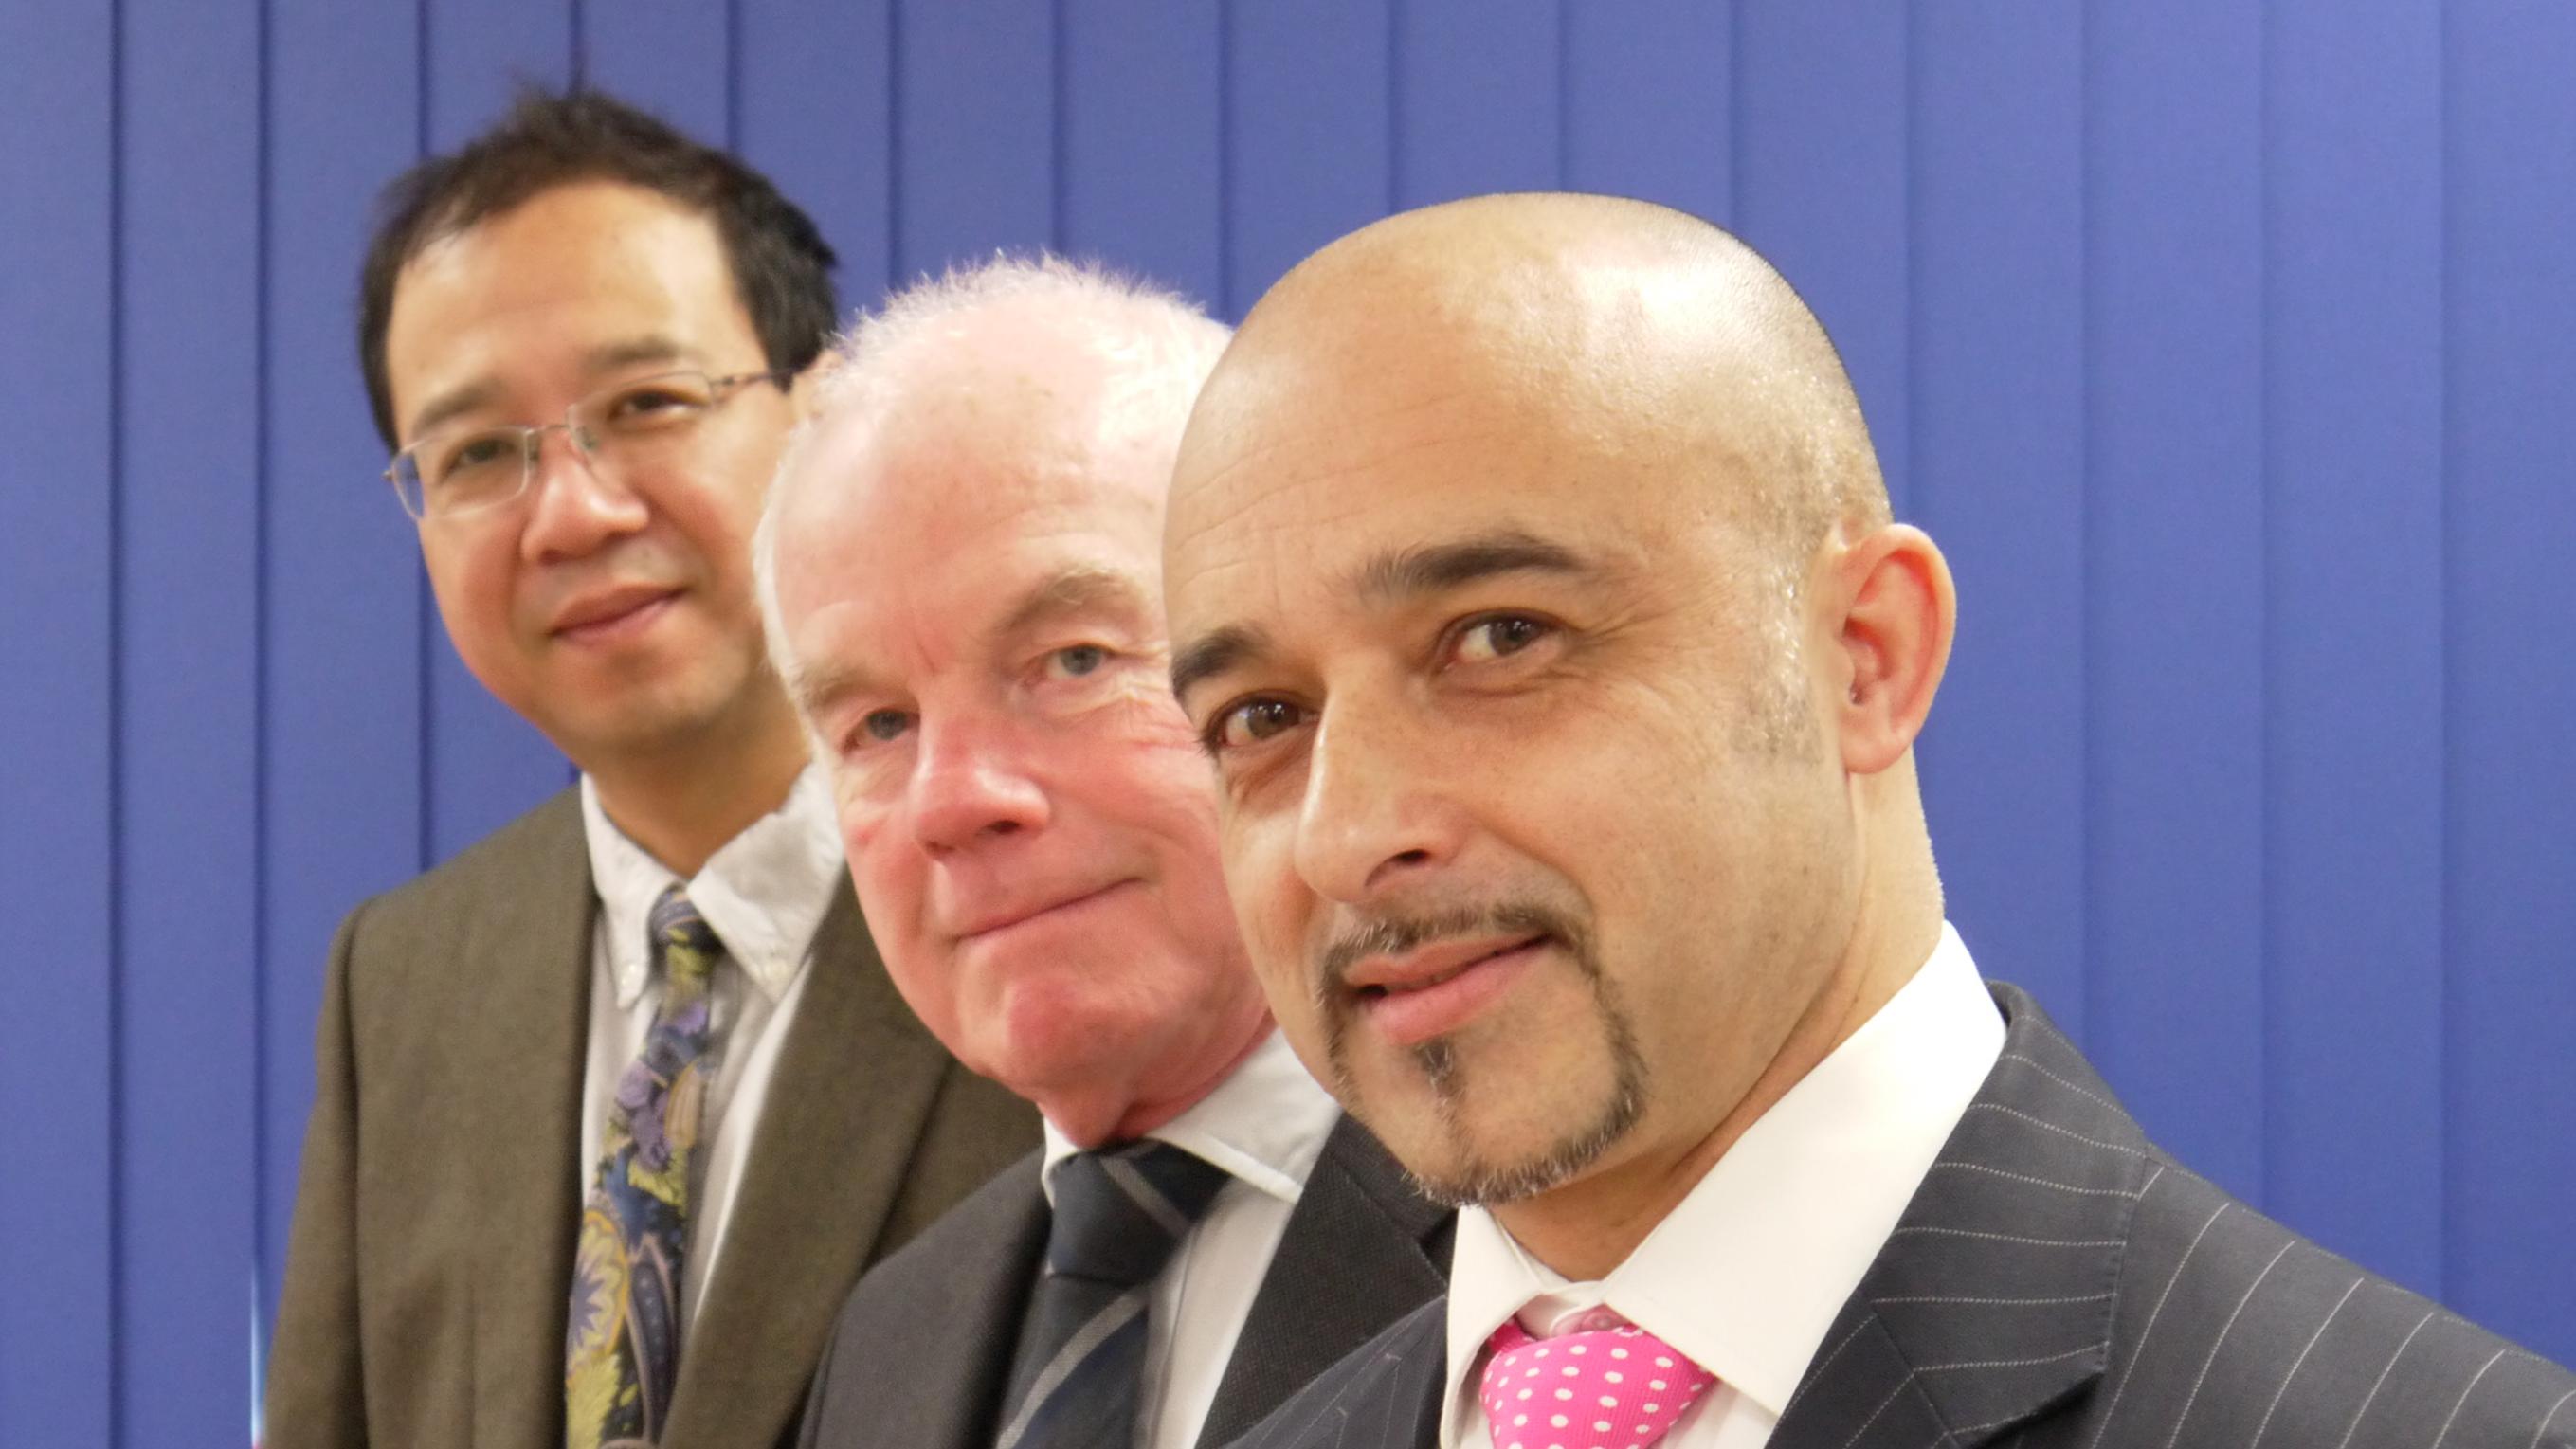 Oxford develops tiny mesh tube devices to treat brain aneurysms